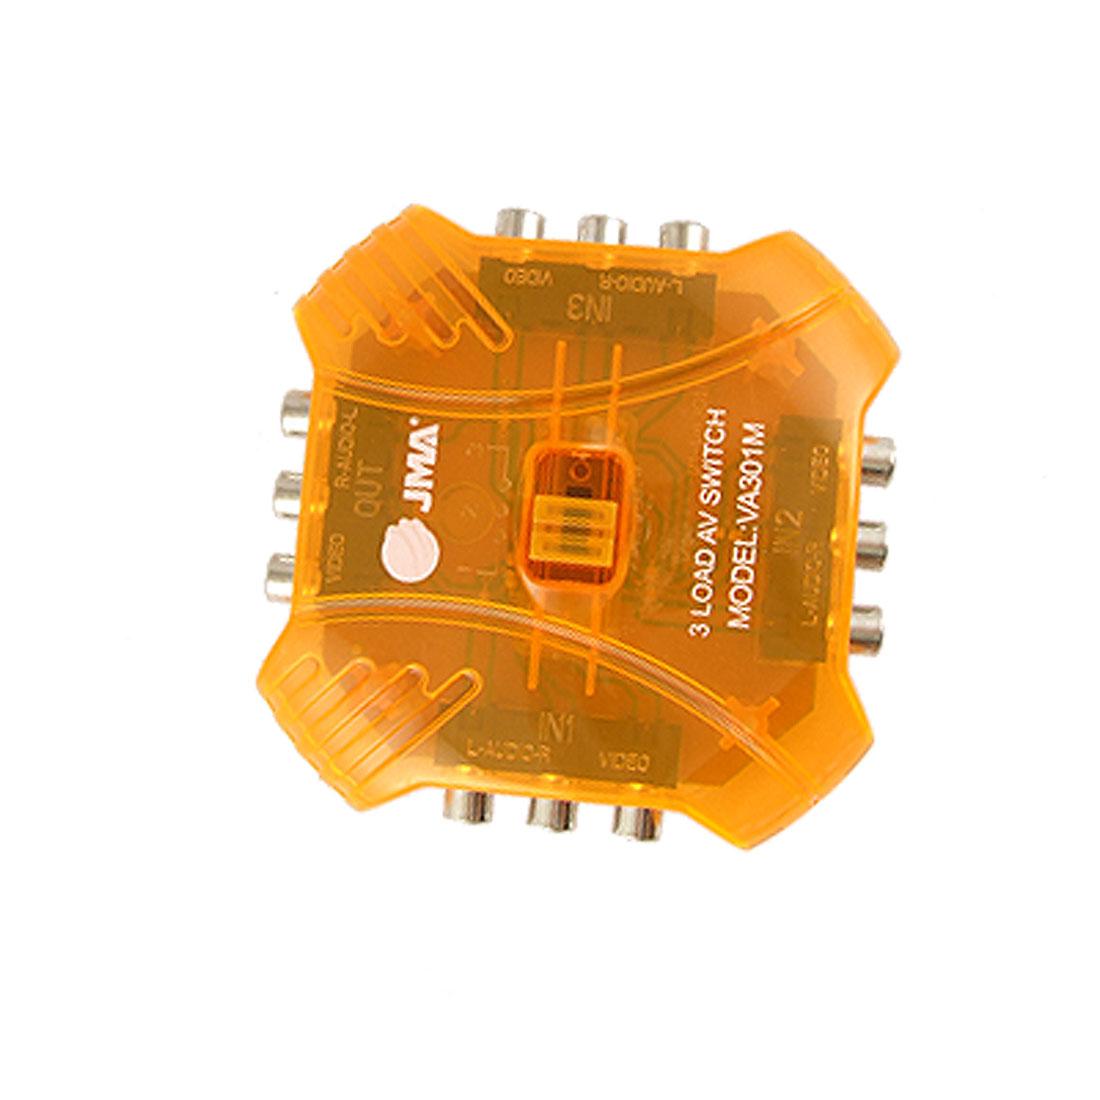 Orange 3 Way Audio Video RCA Switcher Switch Splitter